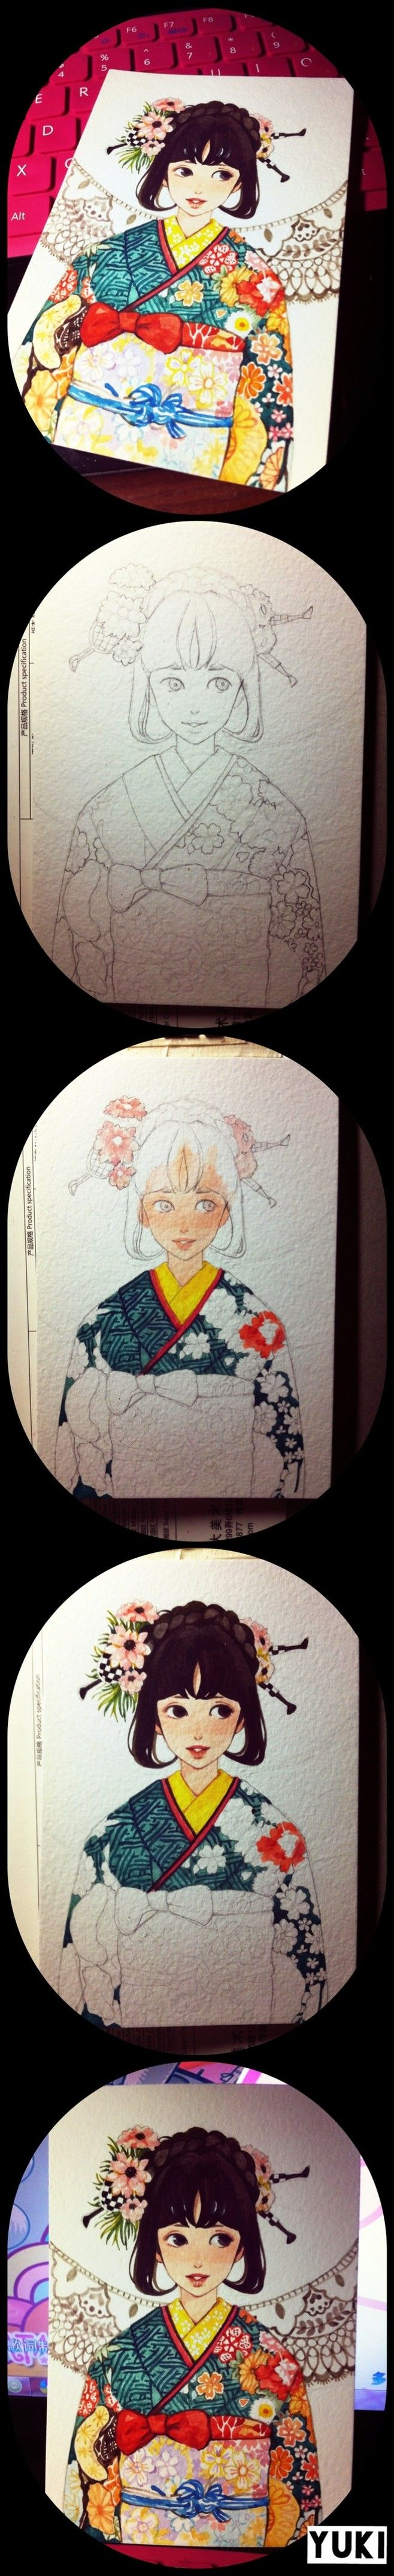 yukiyin@szeki采集到水彩(123图)_花瓣插画/漫画